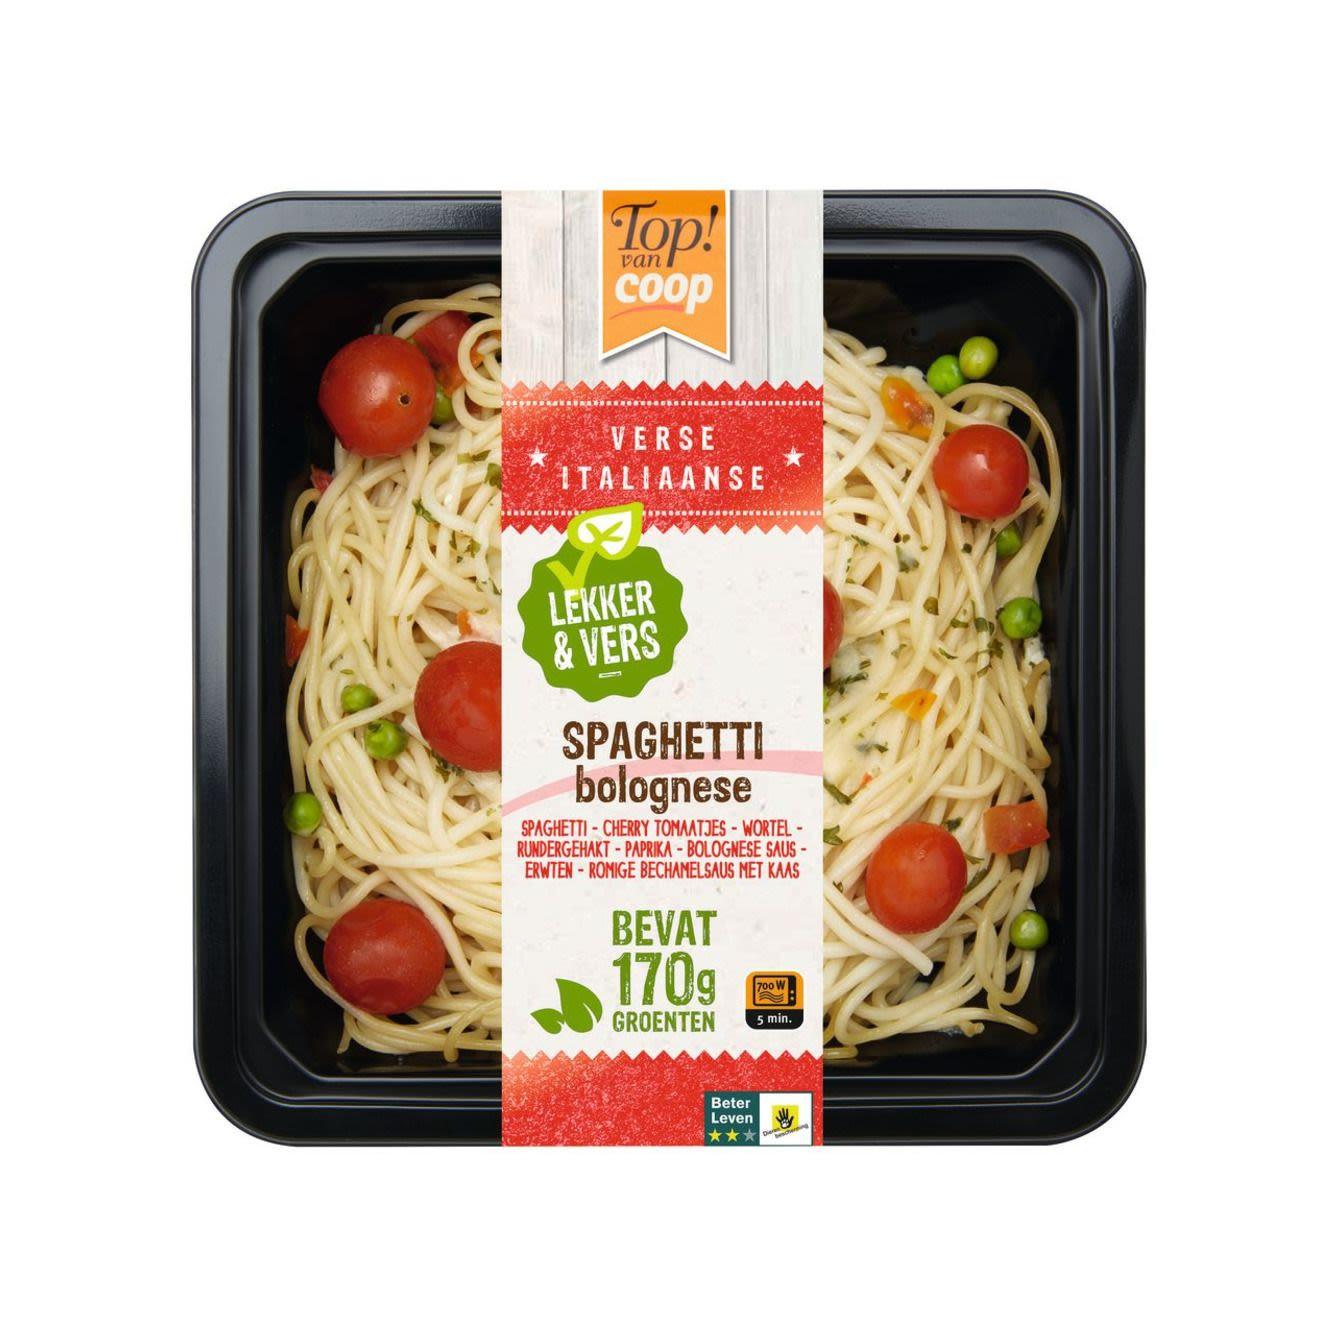 Top! Van Coop Spaghetti Bolognese